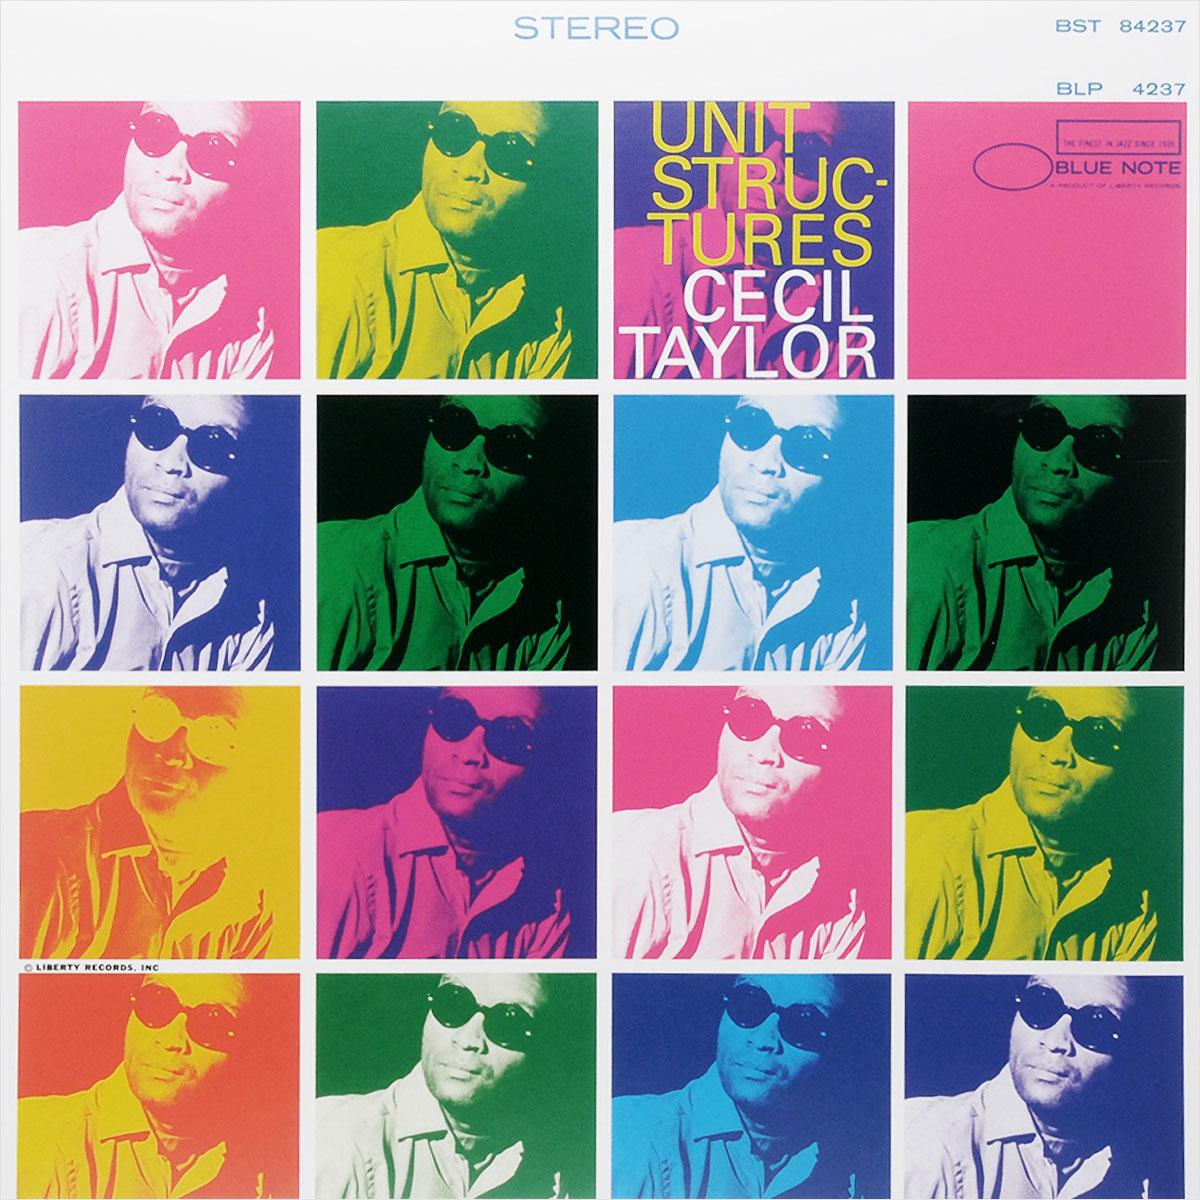 LP 1:Tracks 1 - 2LP 2:Tracks 3 - 4